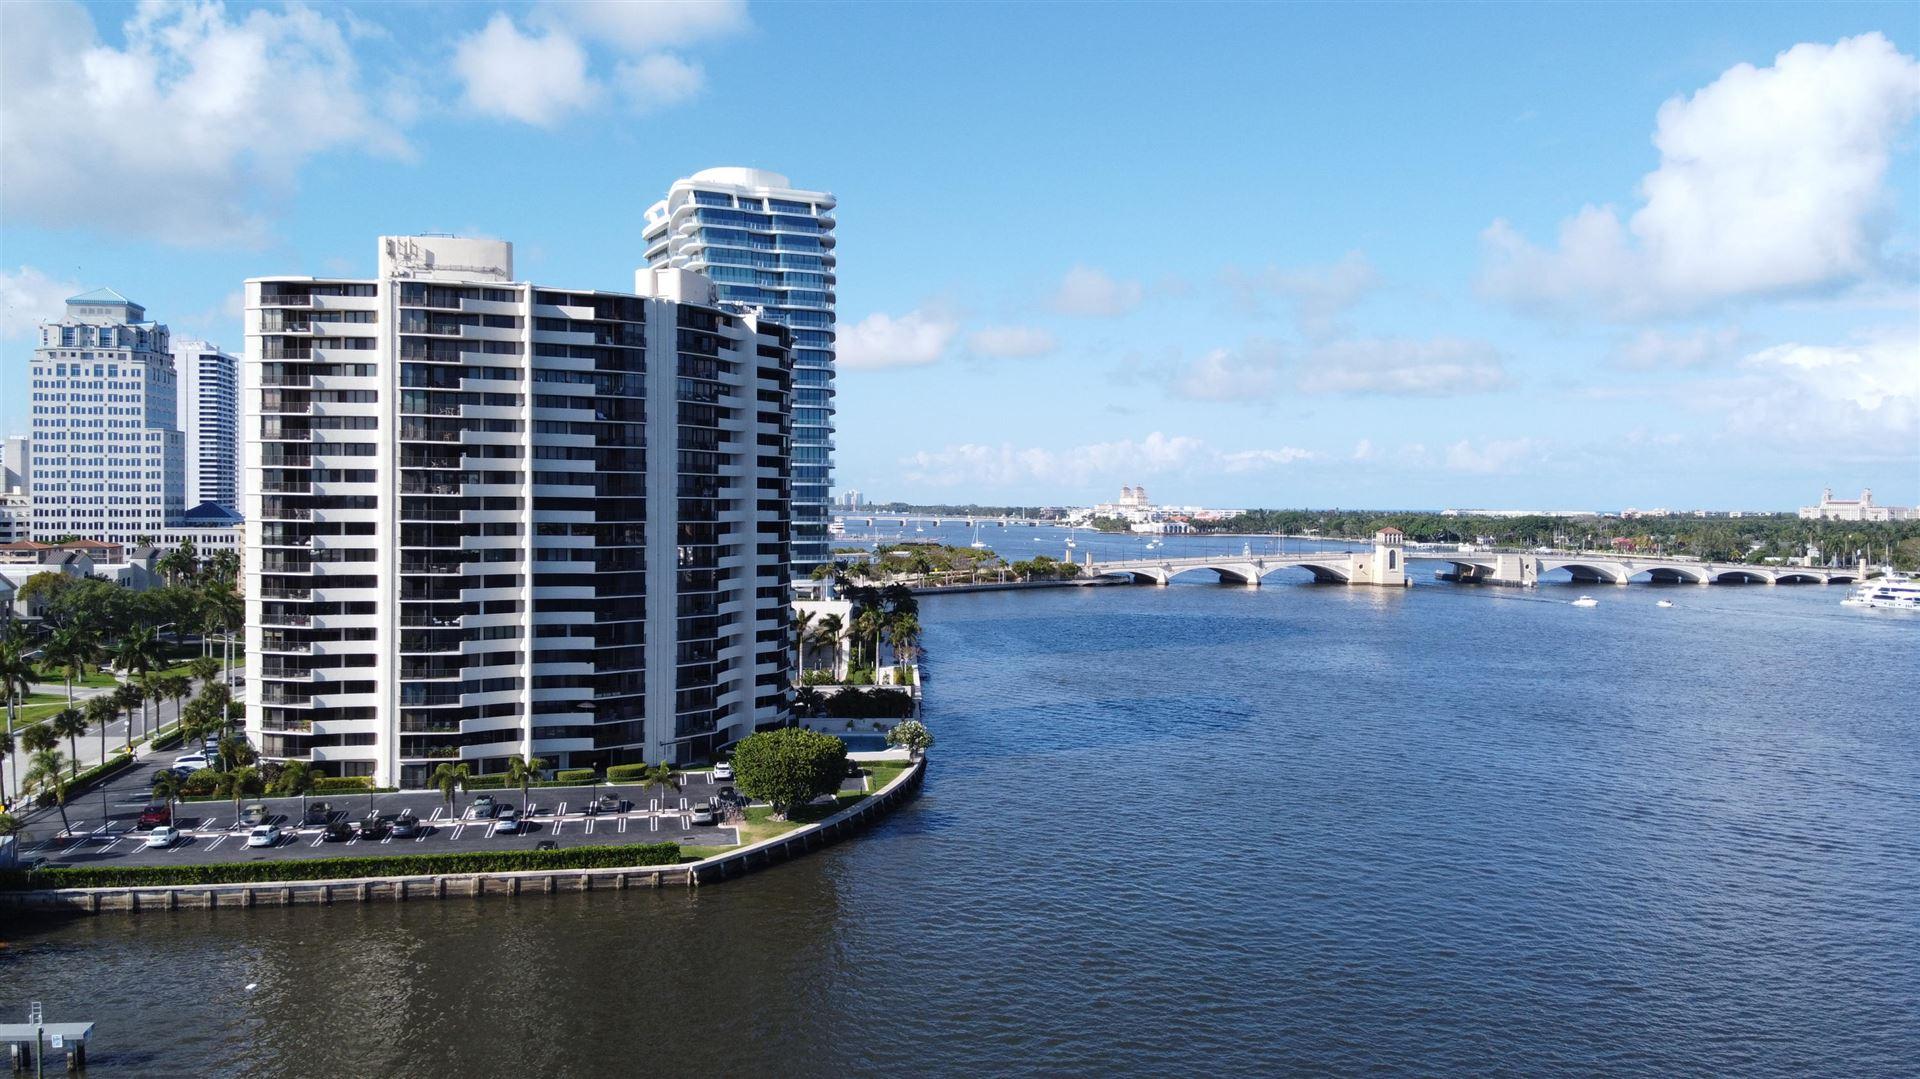 1200 S Flagler Drive #406, West Palm Beach, FL 33401 - #: RX-10653546